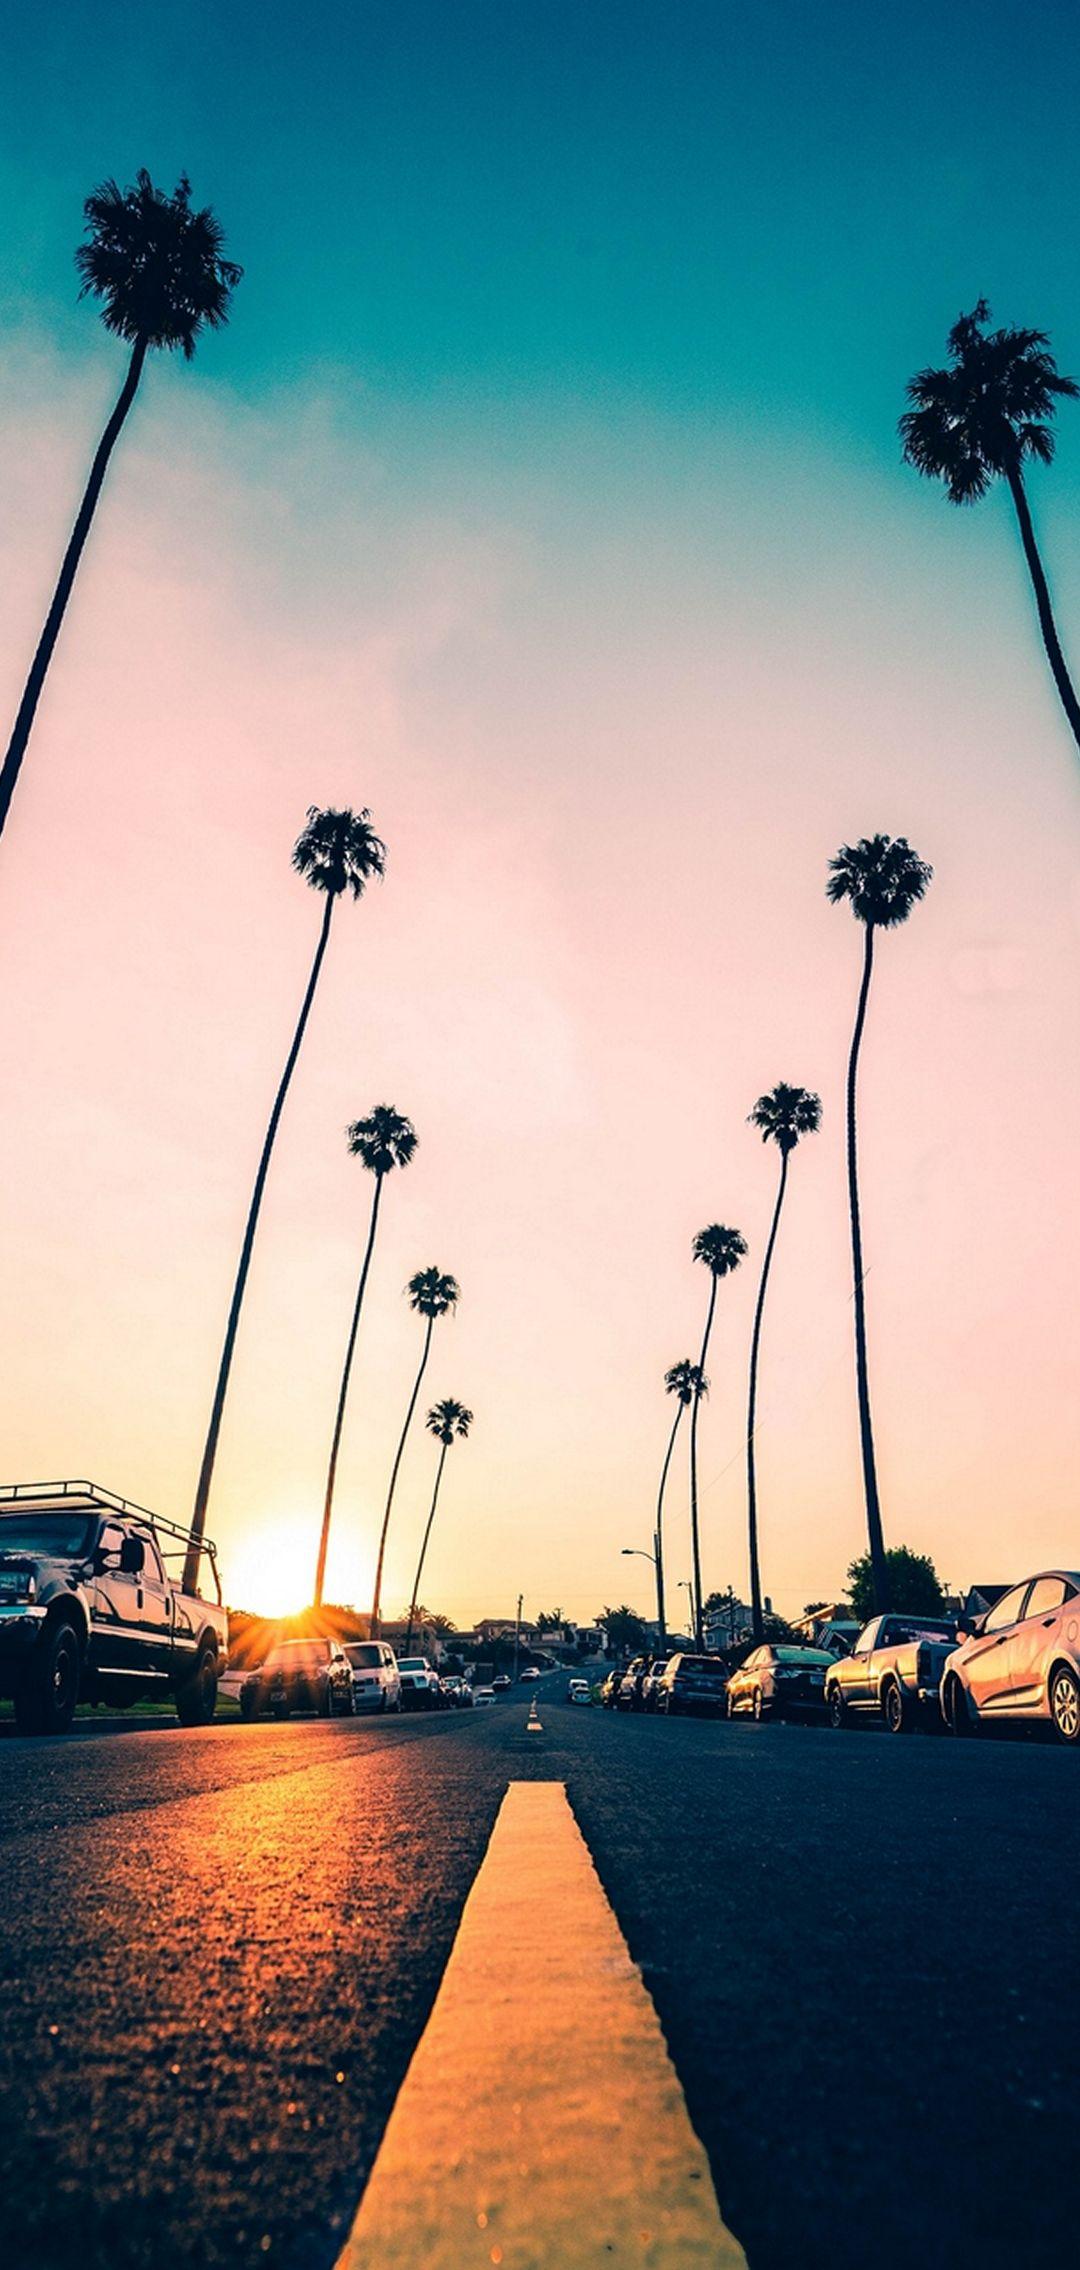 Road Palm Trees Asphalt